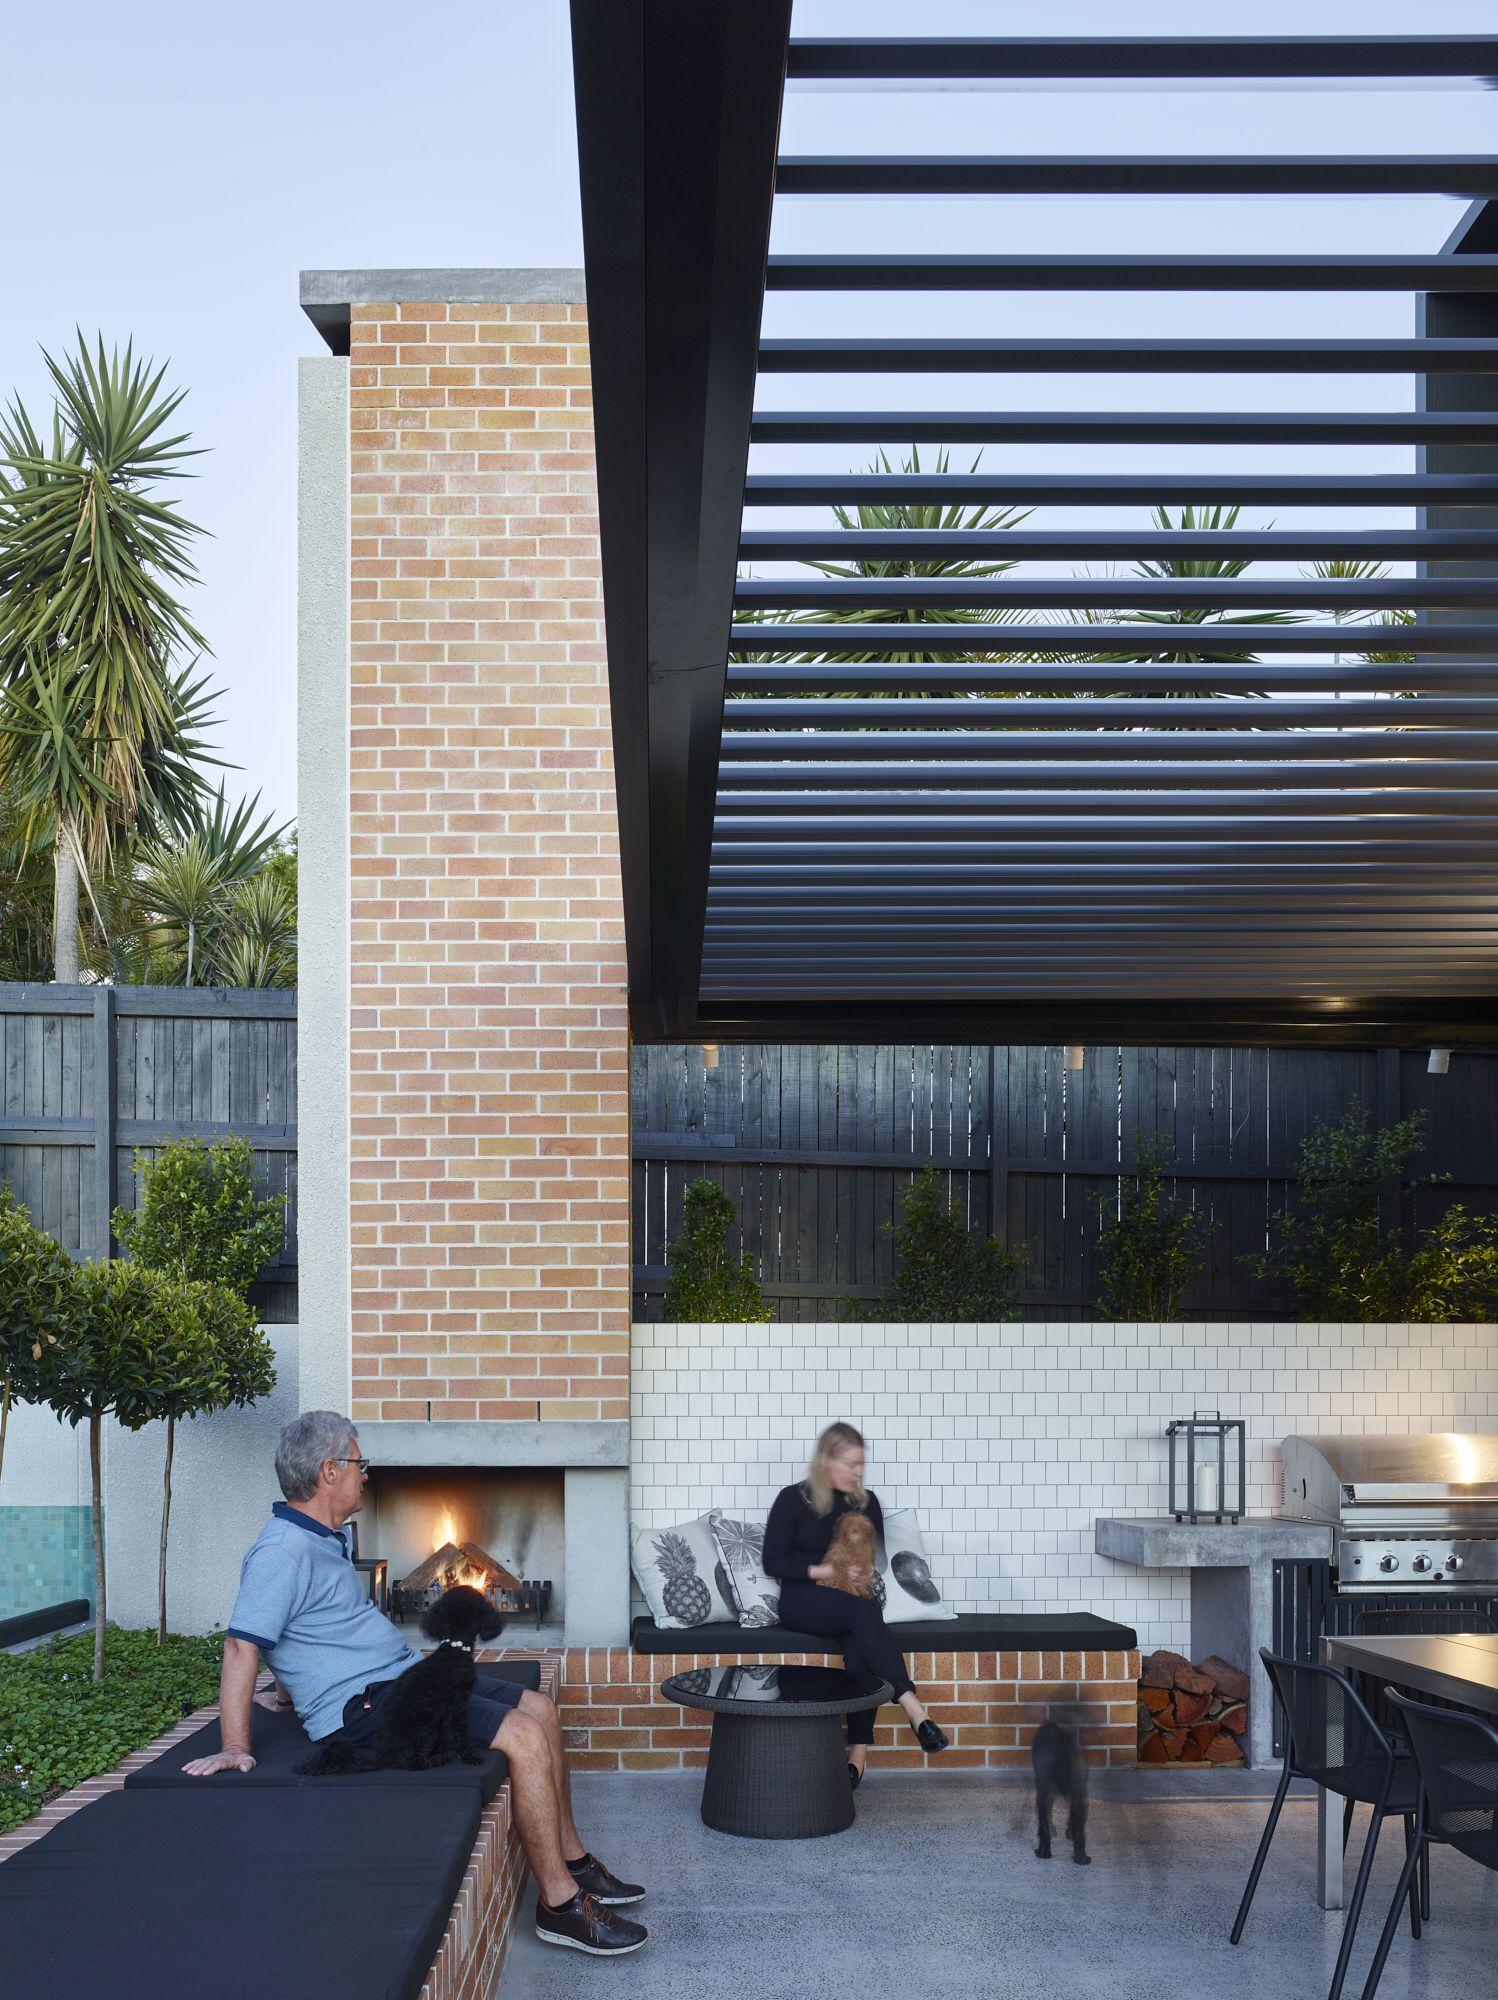 Folkhouse - Queensland Australia - Shaun Lockyer Architects More